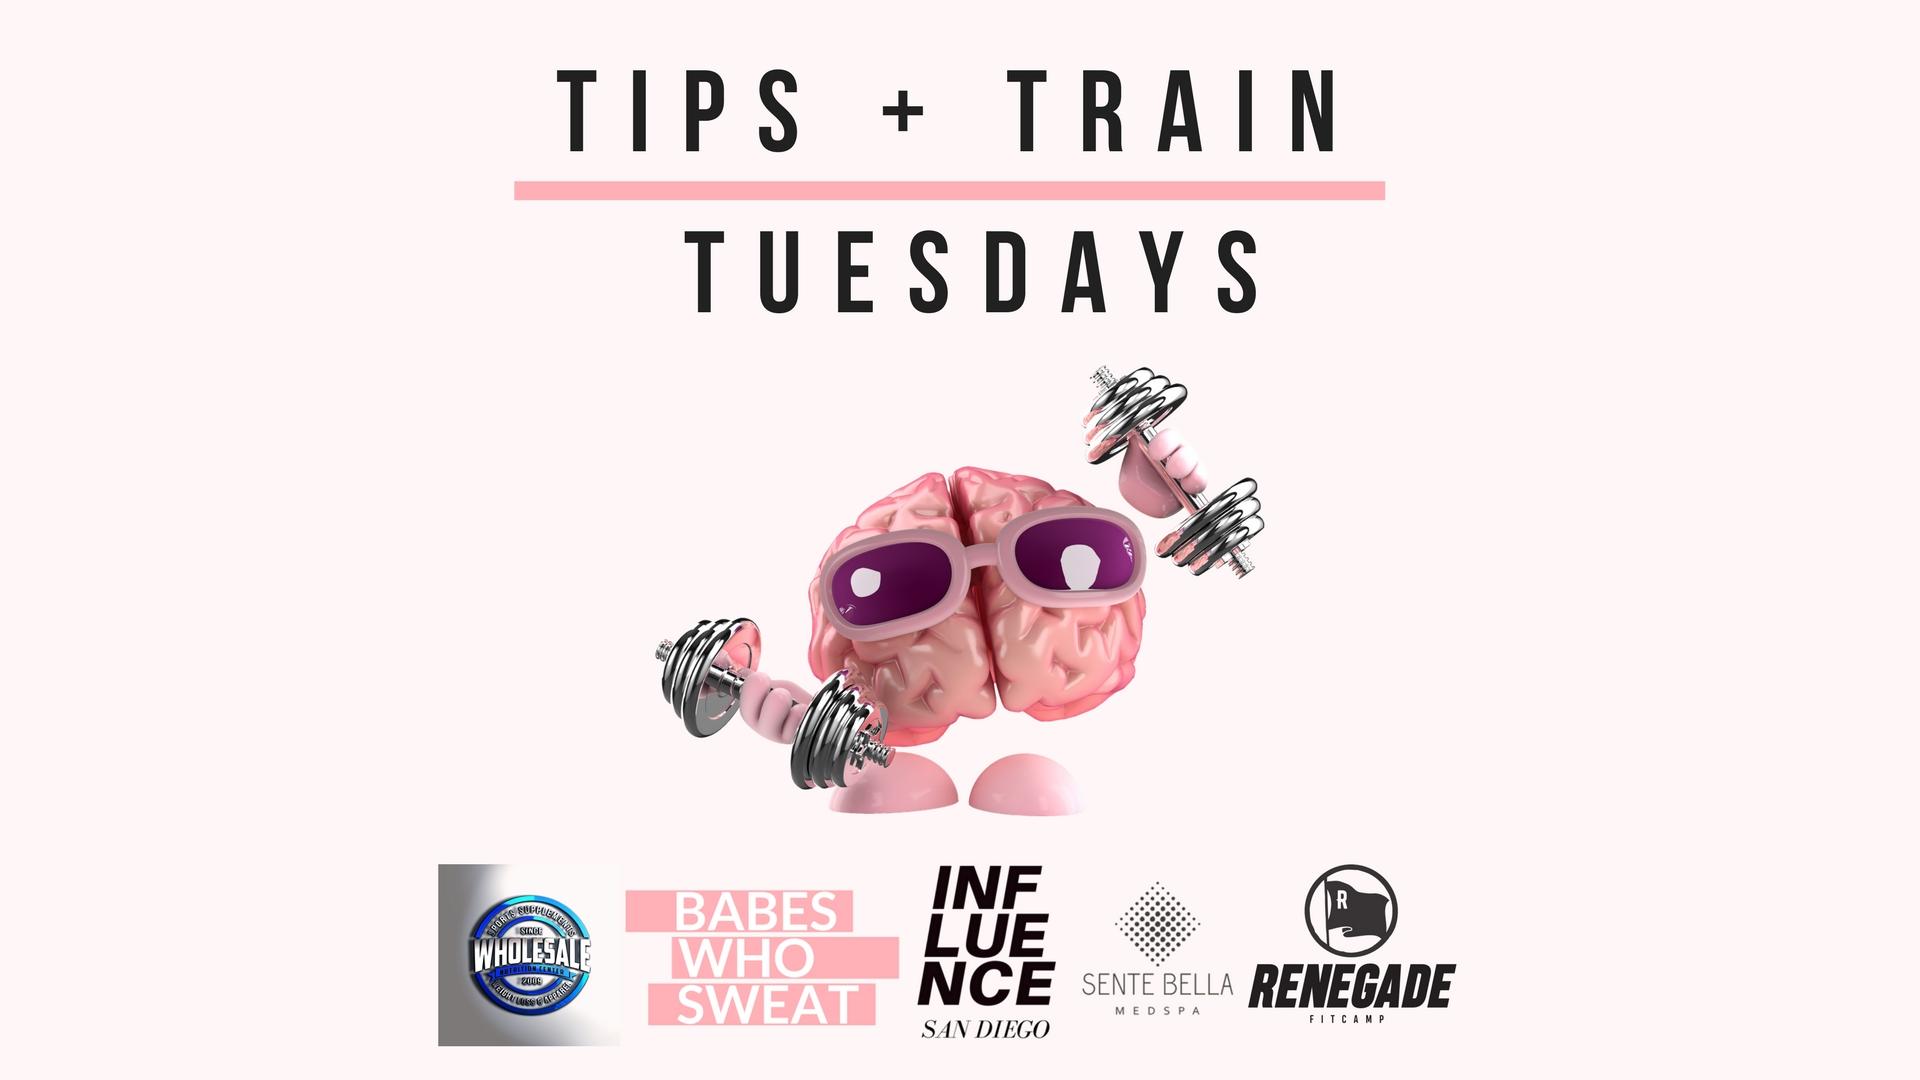 Tips N Train Tuesdays